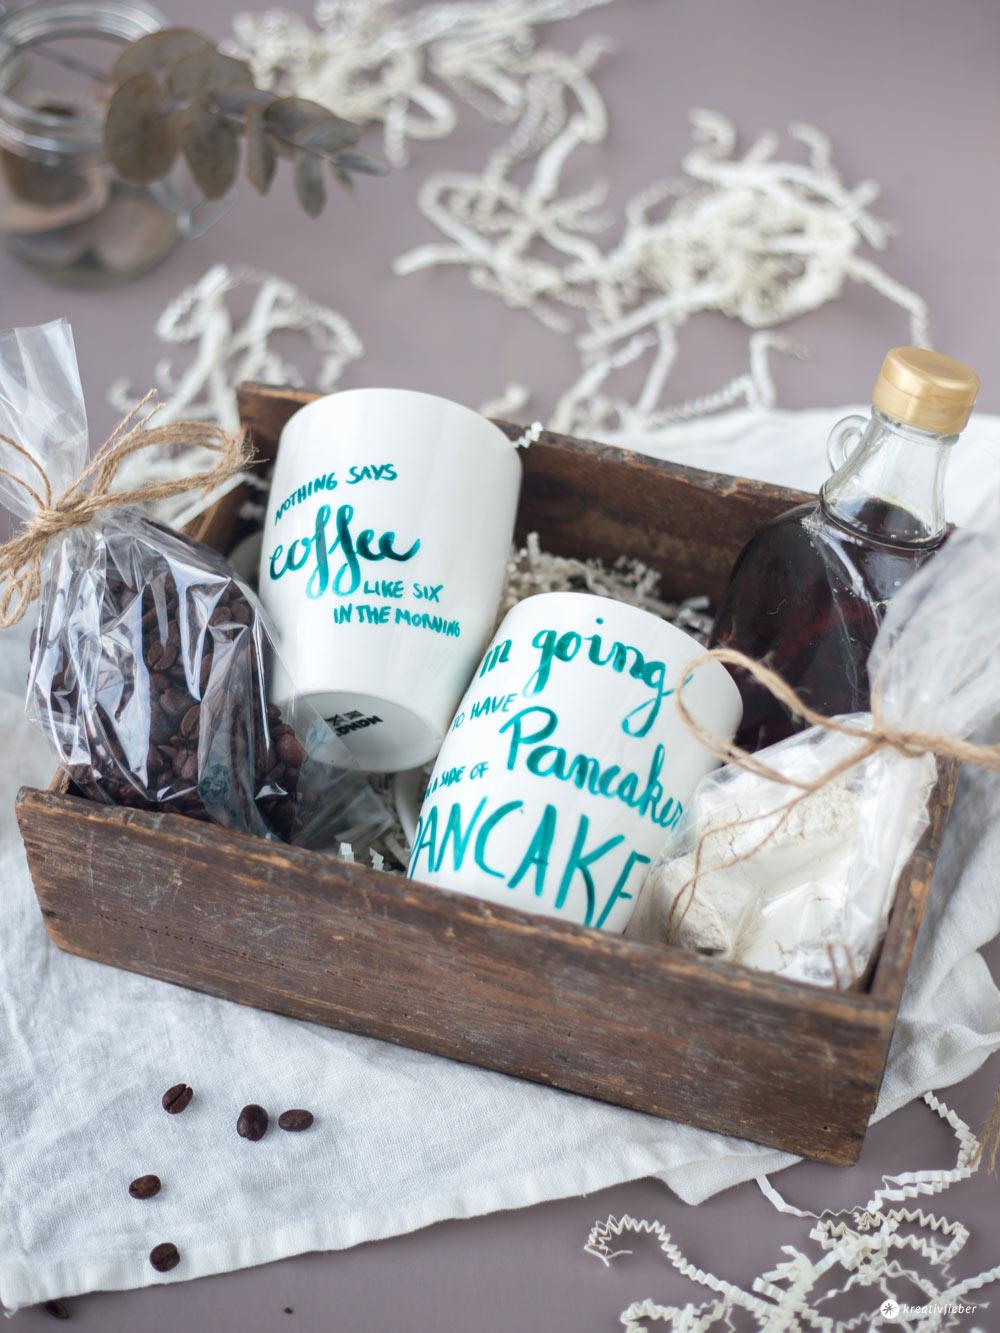 diy gilmore girls geschenkset mit handlettering tassen geschenkidee. Black Bedroom Furniture Sets. Home Design Ideas